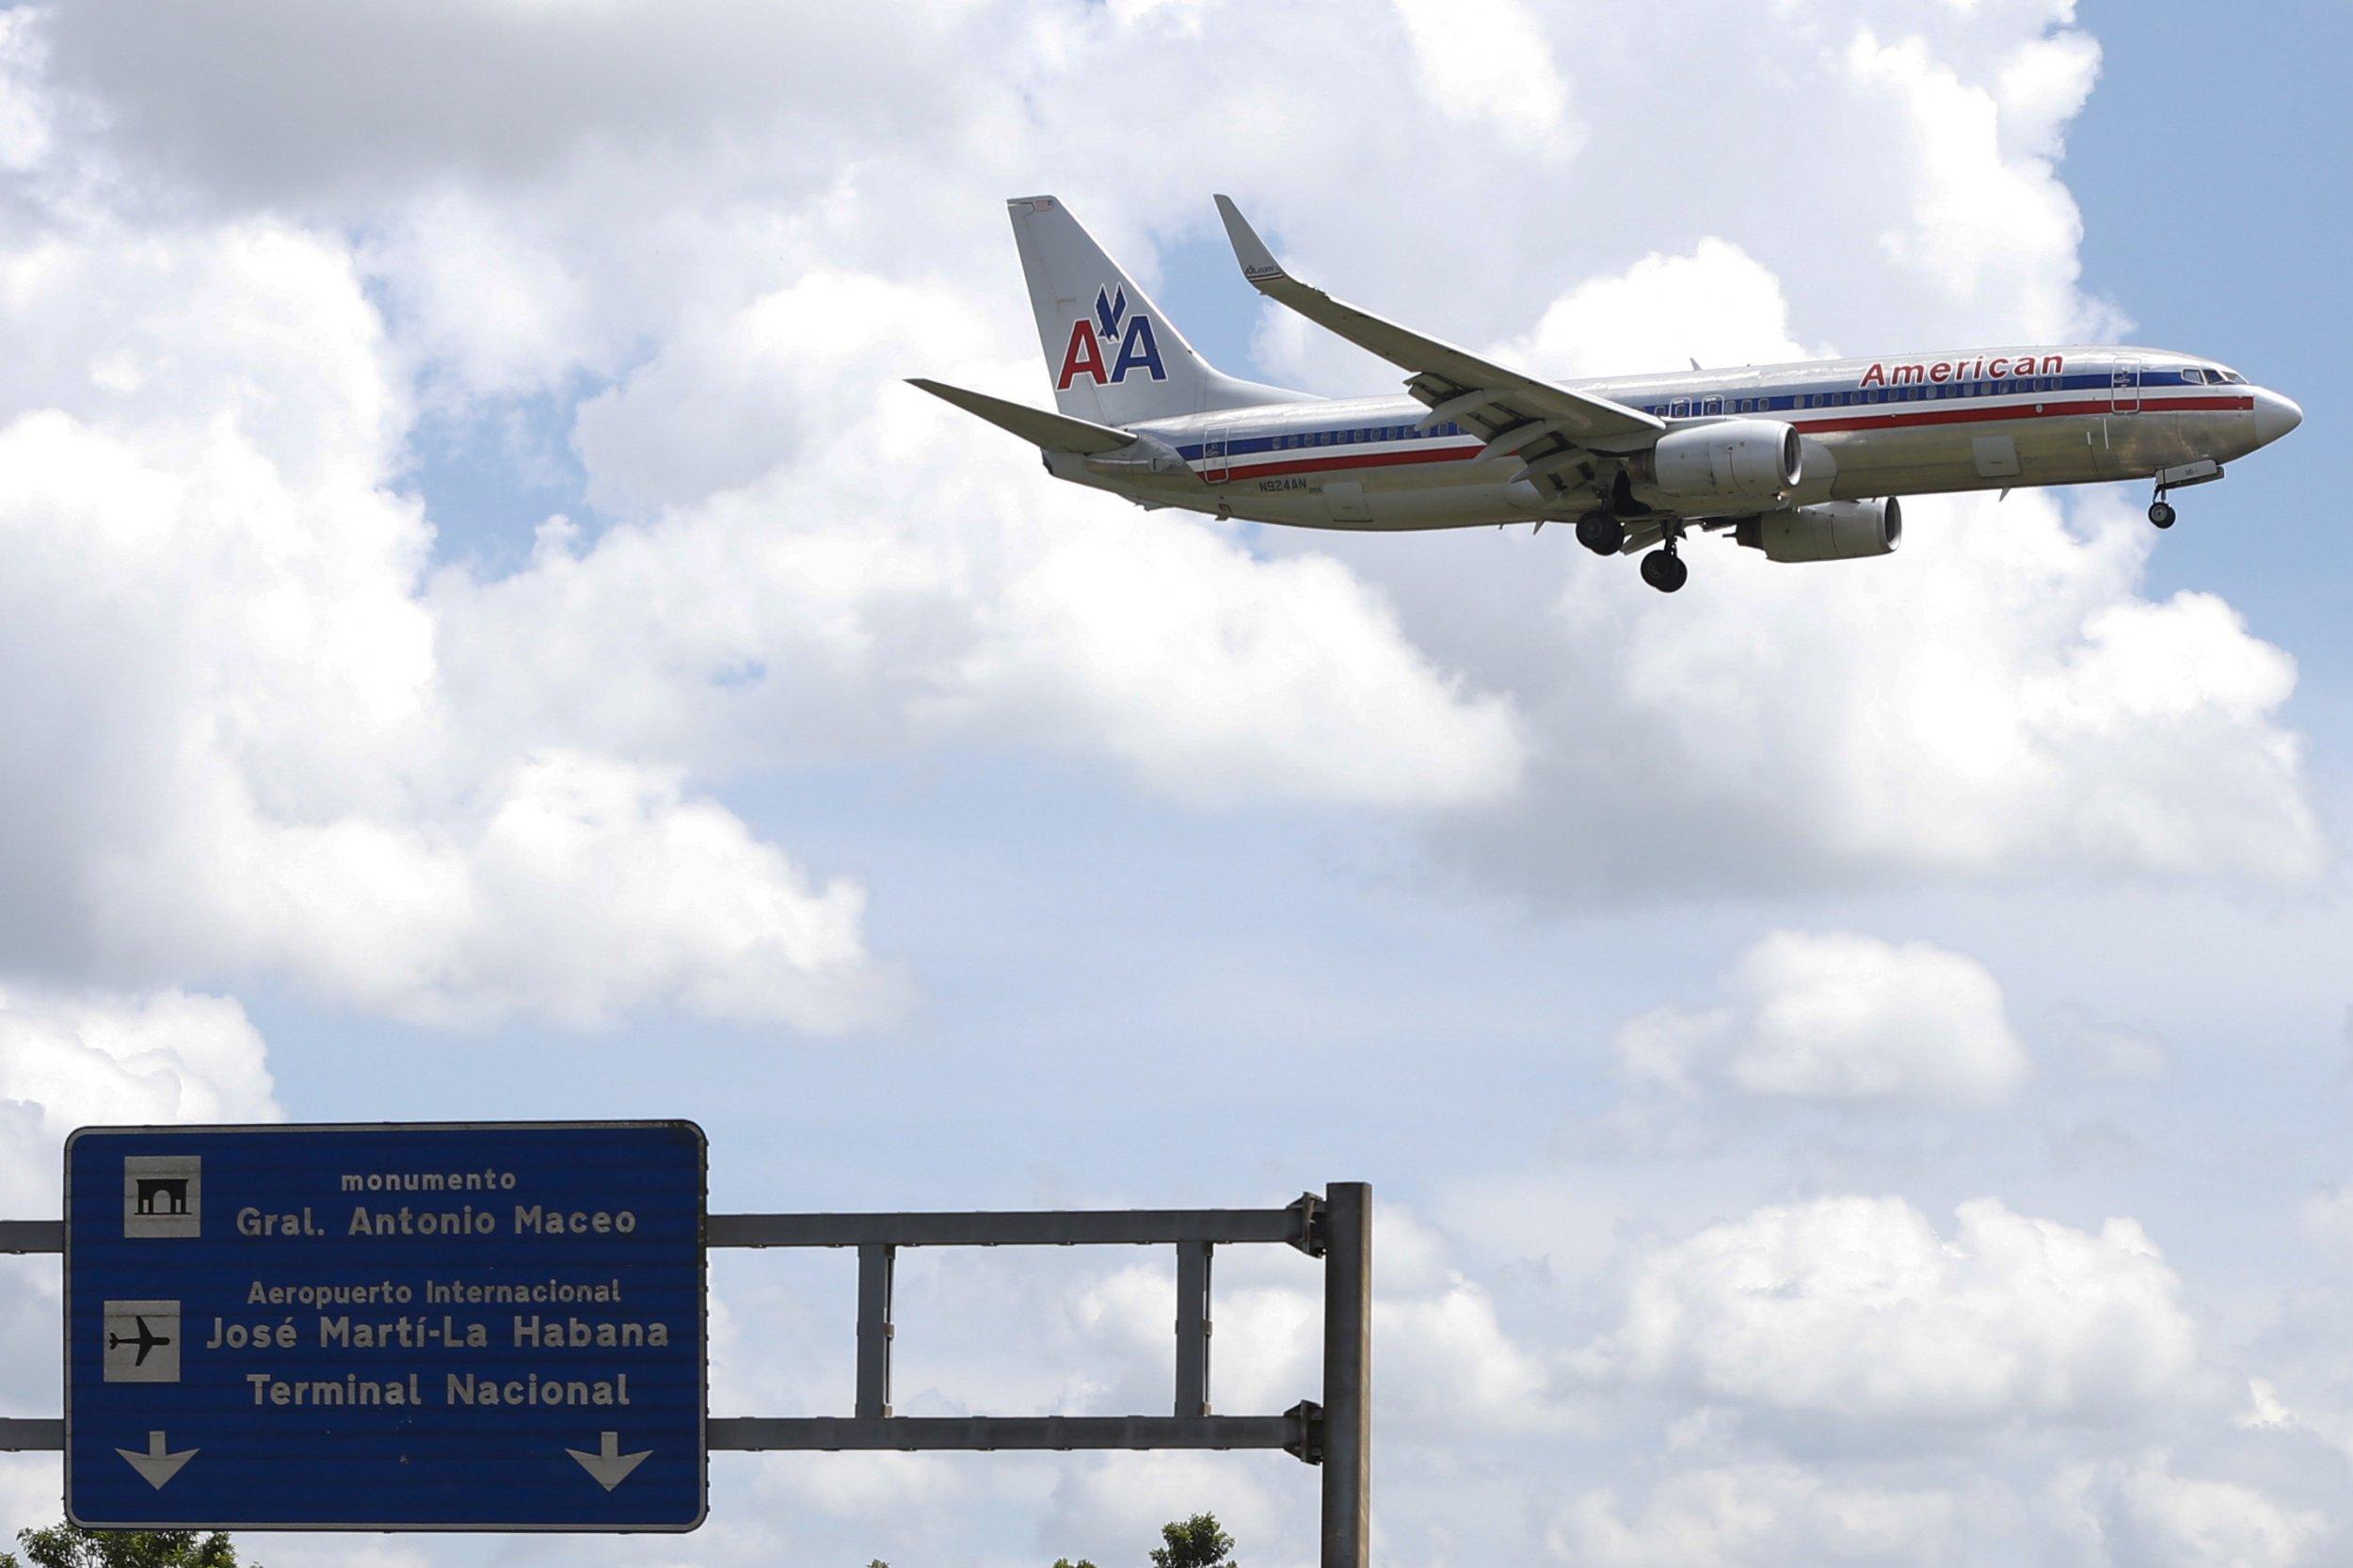 0610_american_airlines_cuba